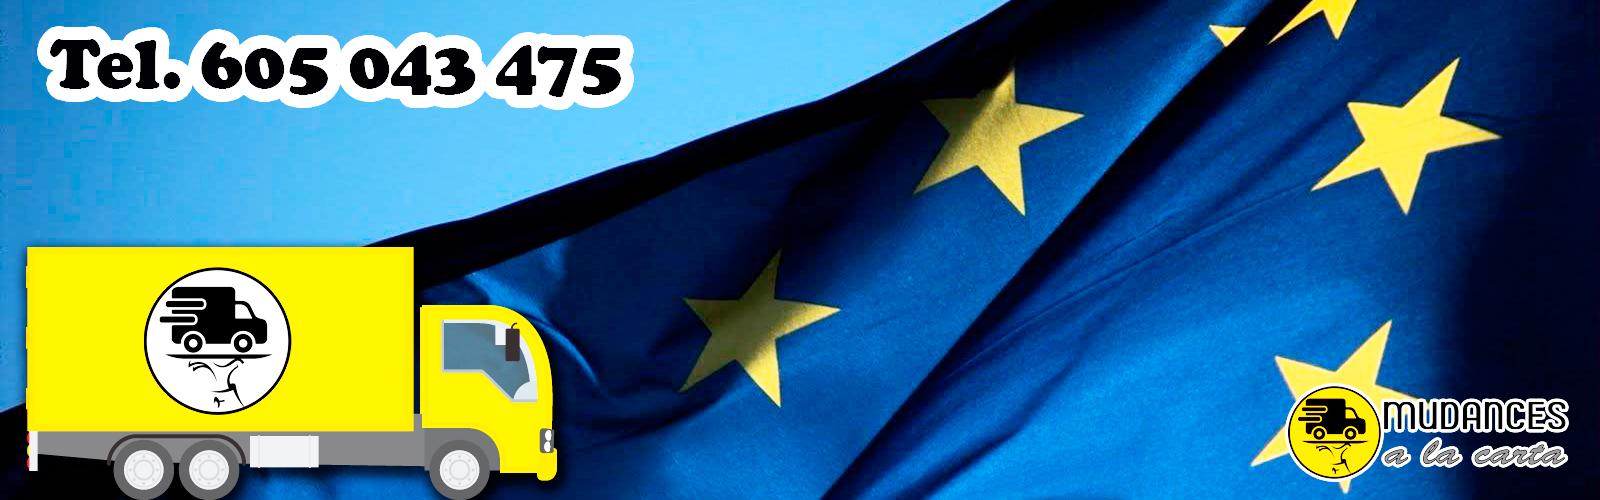 mudances-eurozona